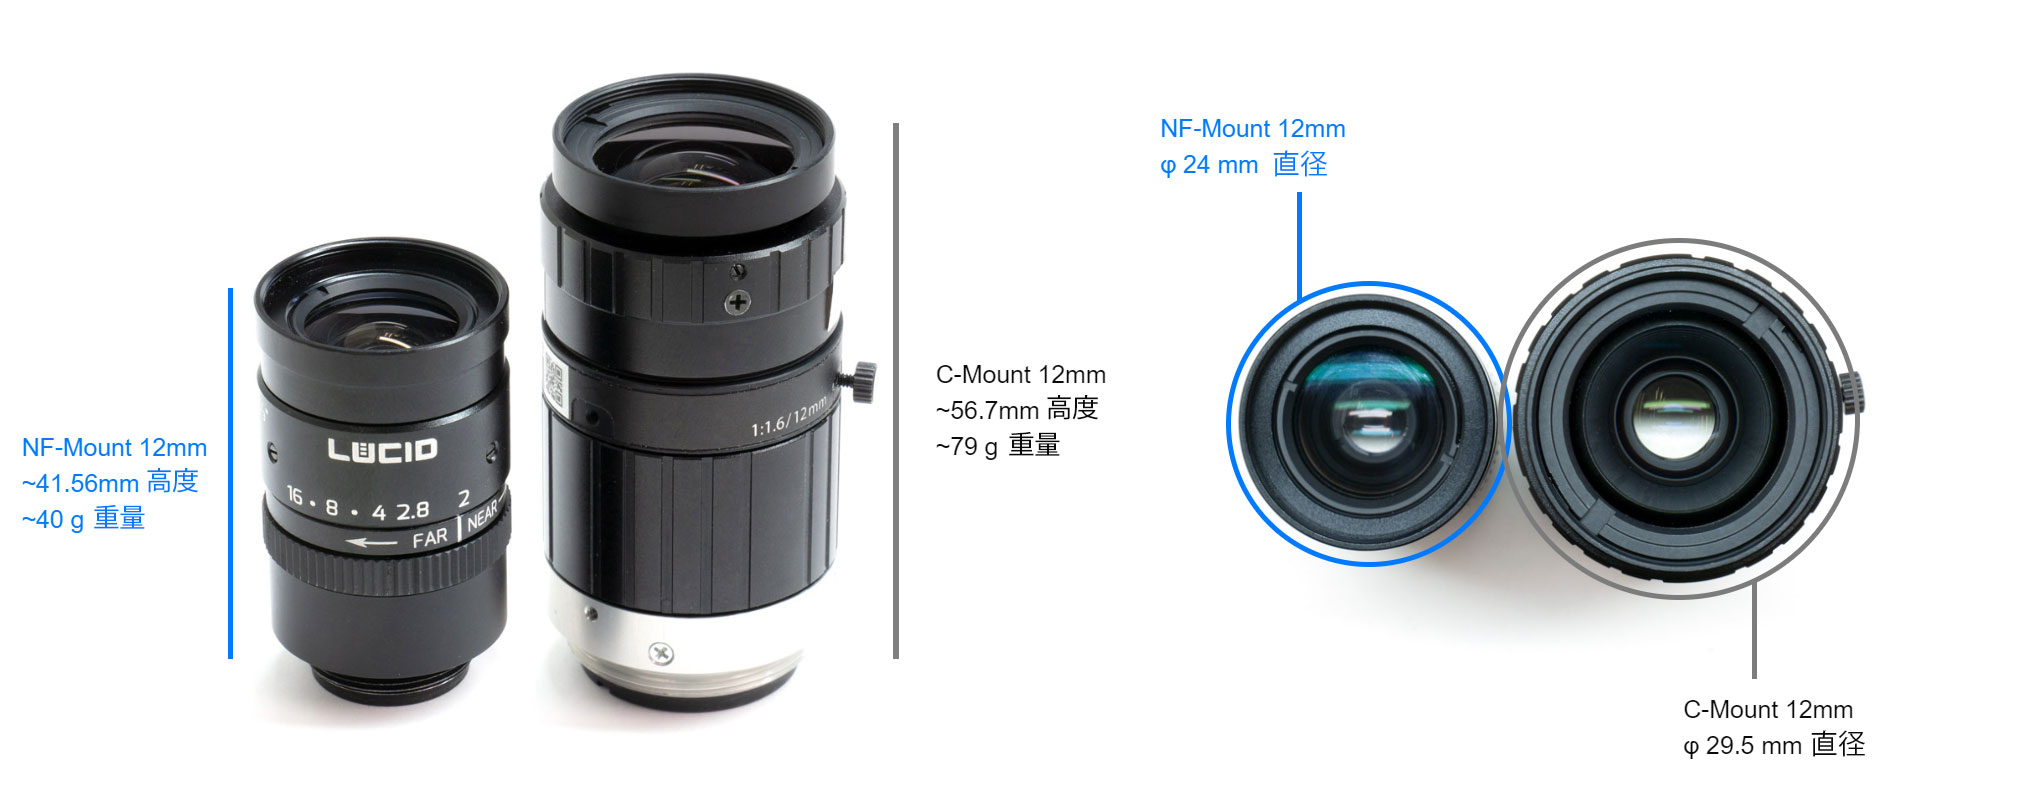 nf安装镜头比c安装更小,更轻